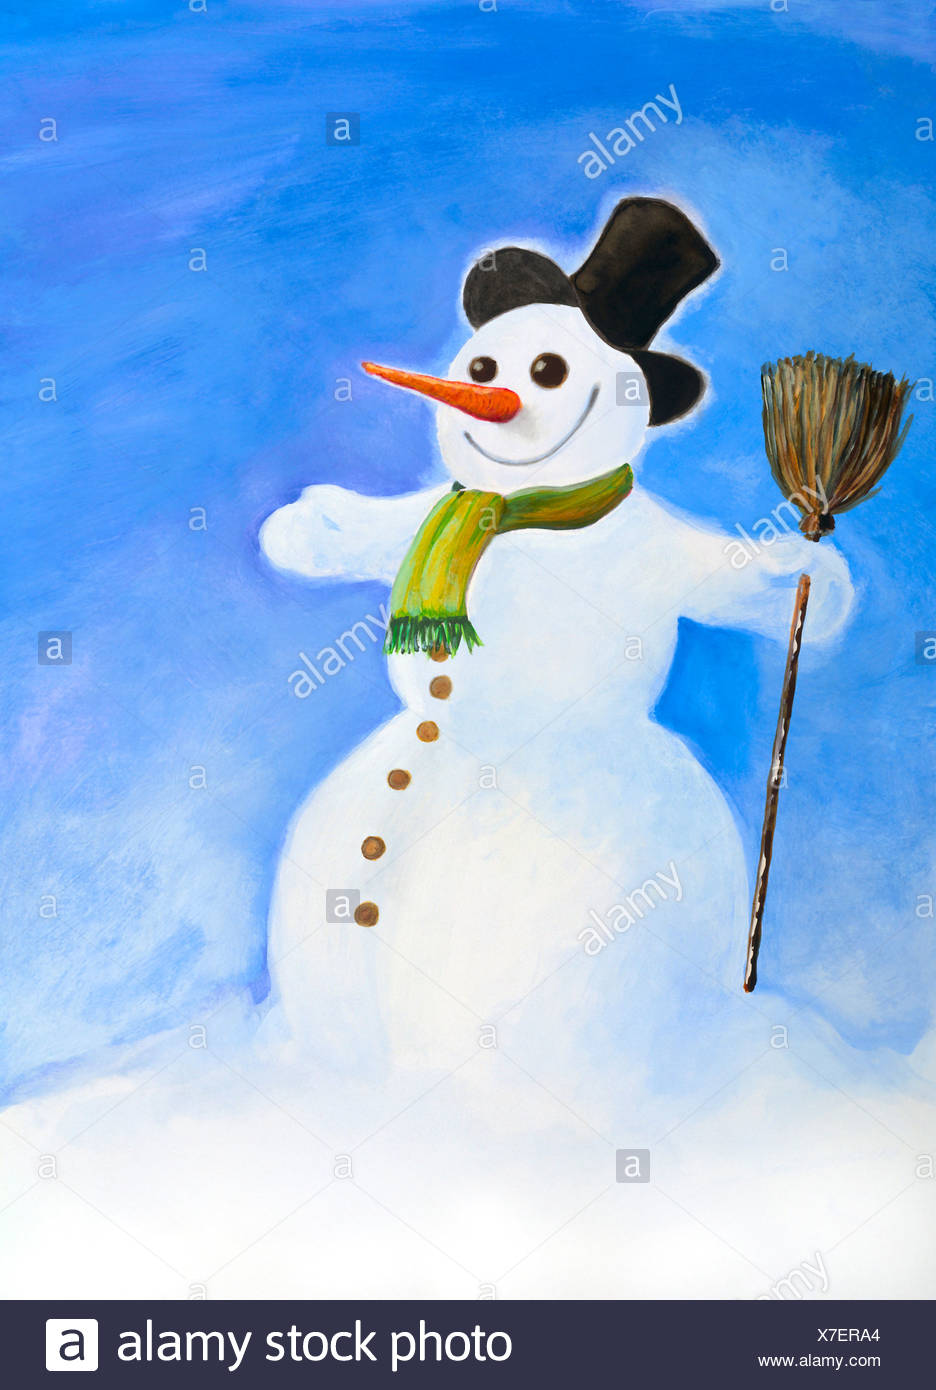 Snowman, illustration - Stock Image